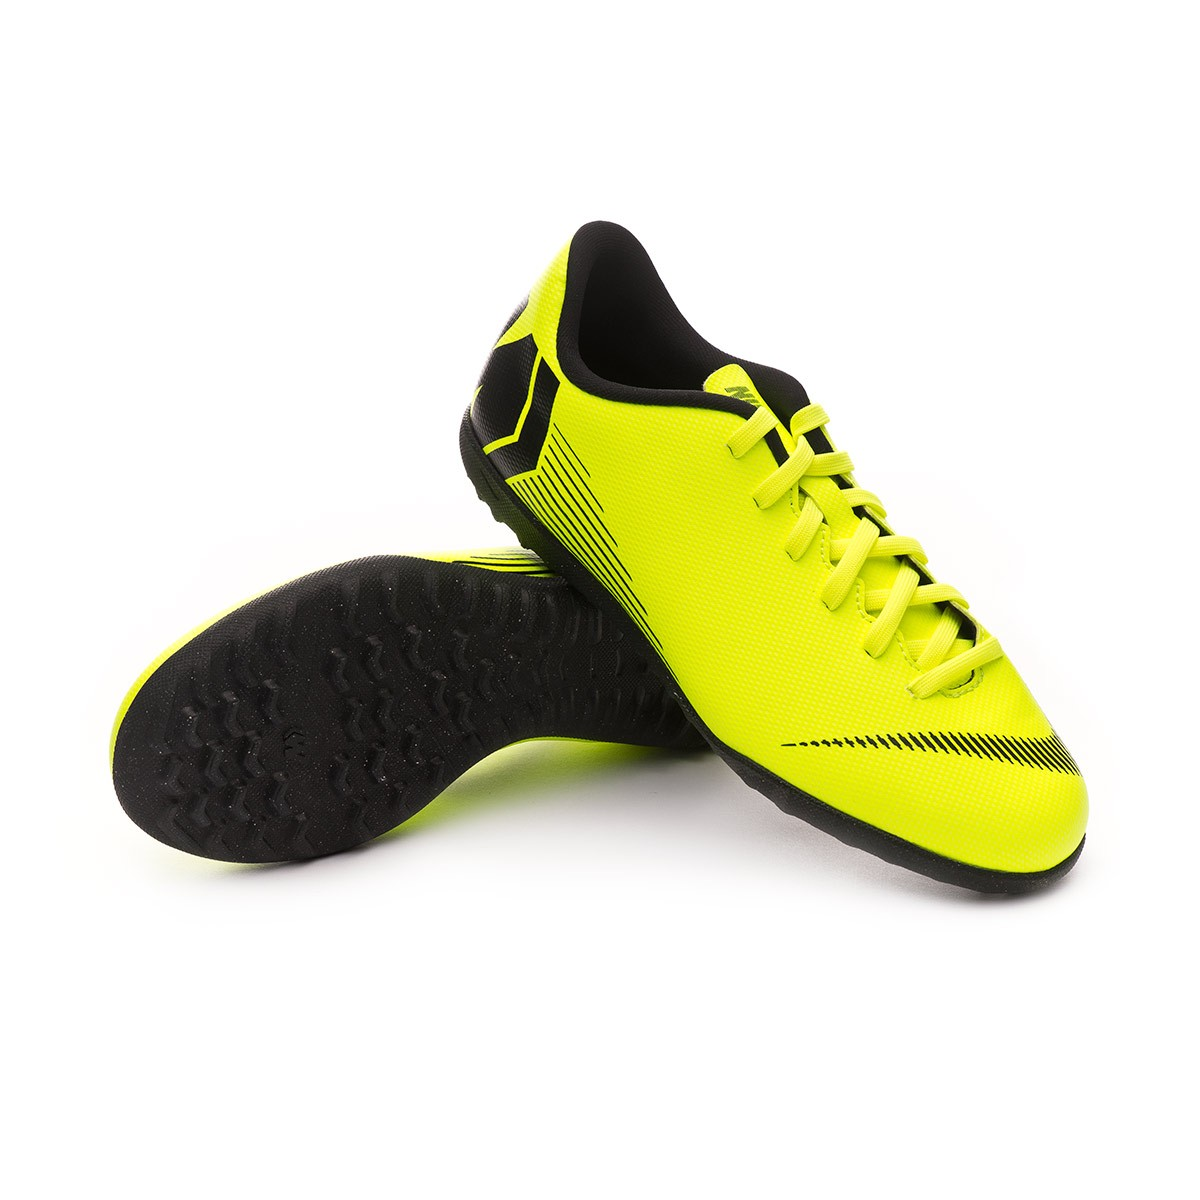 02706ac44 Nike Kids Mercurial VaporX XII Club Turf Football Boot. Volt-Black ...